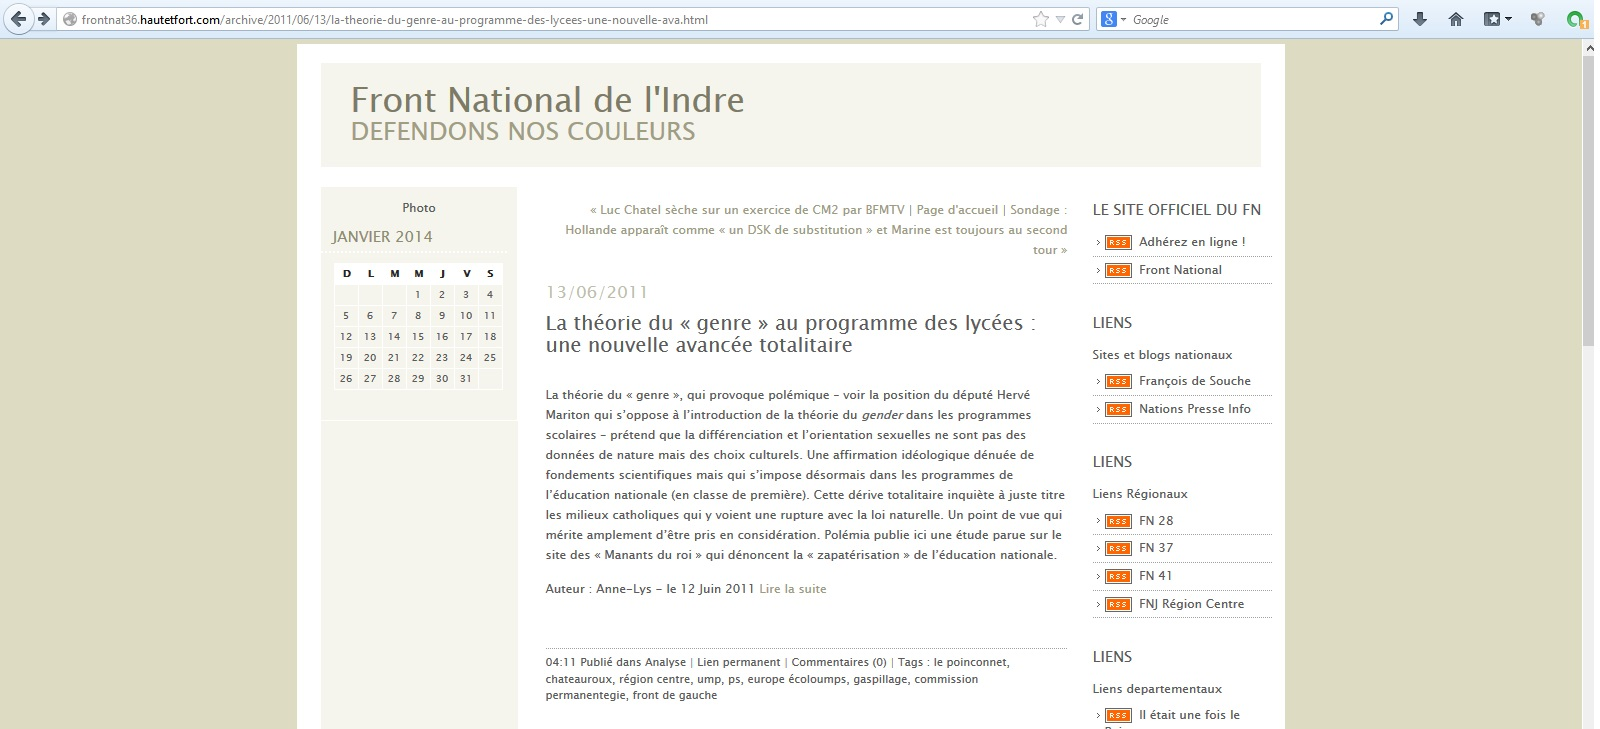 FN_Theorie_du_genre-Indre